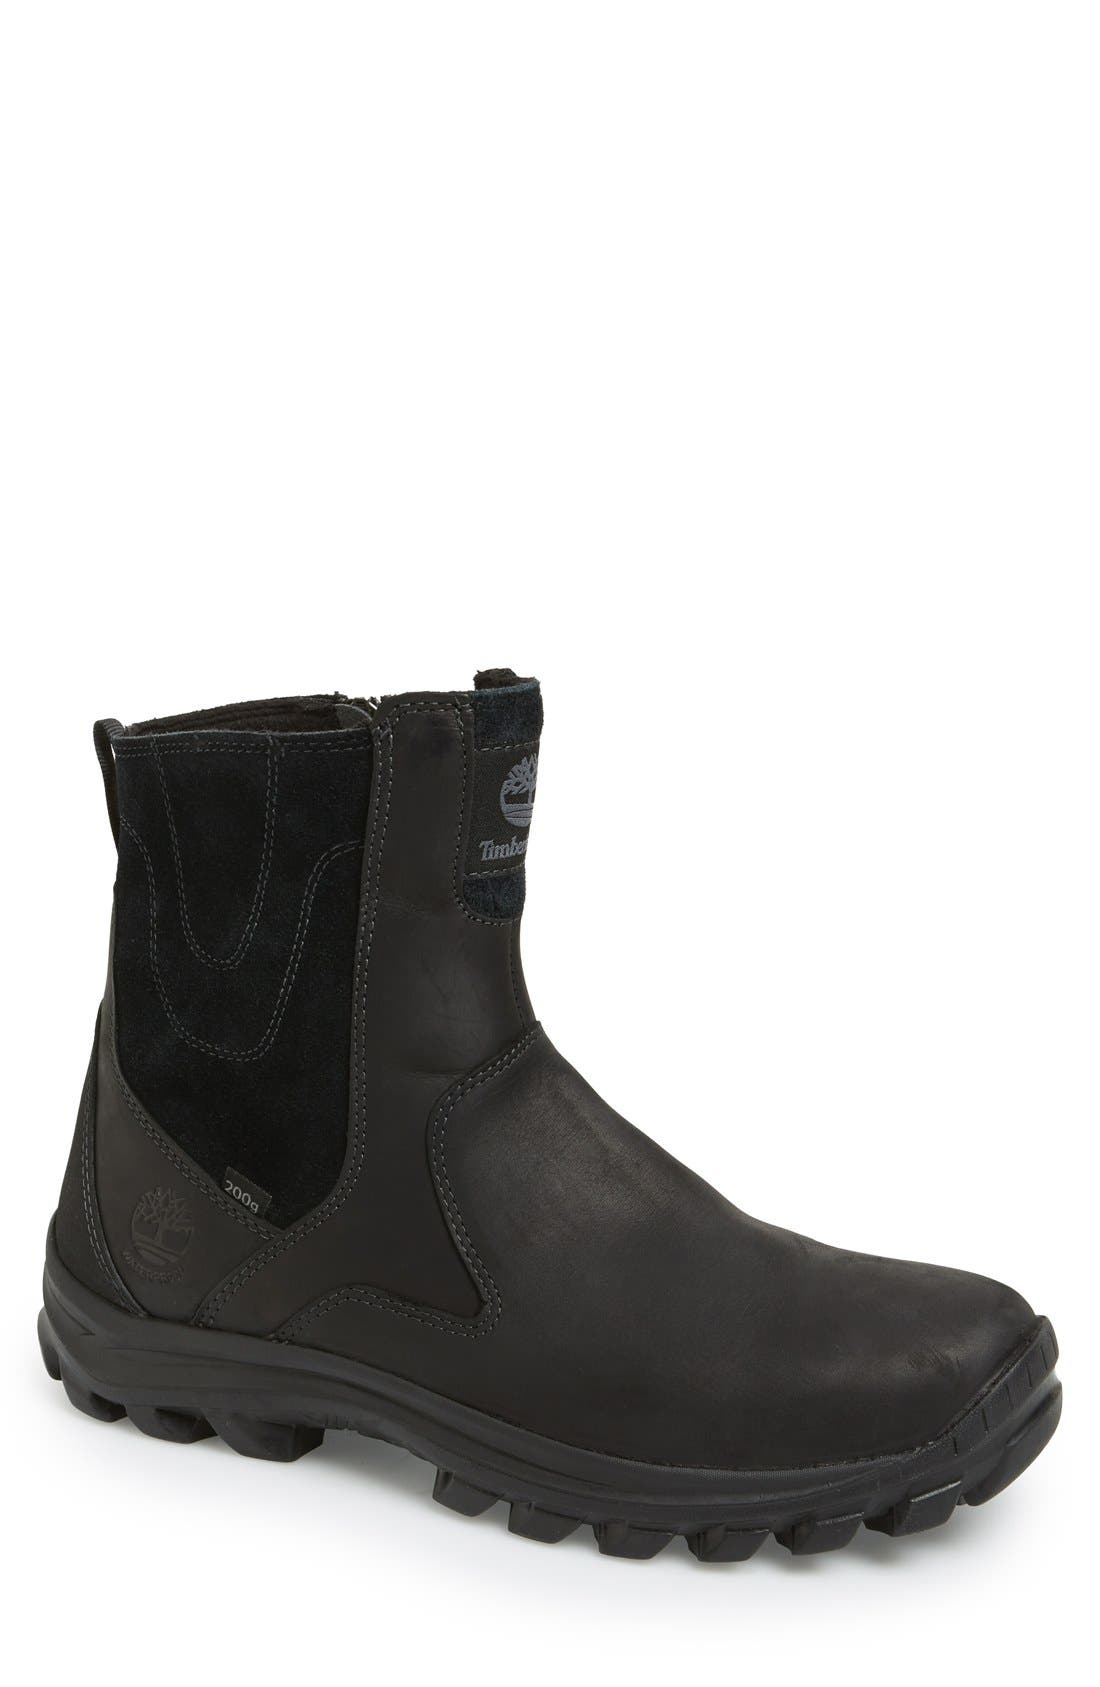 timberland mens chukka boots size 15